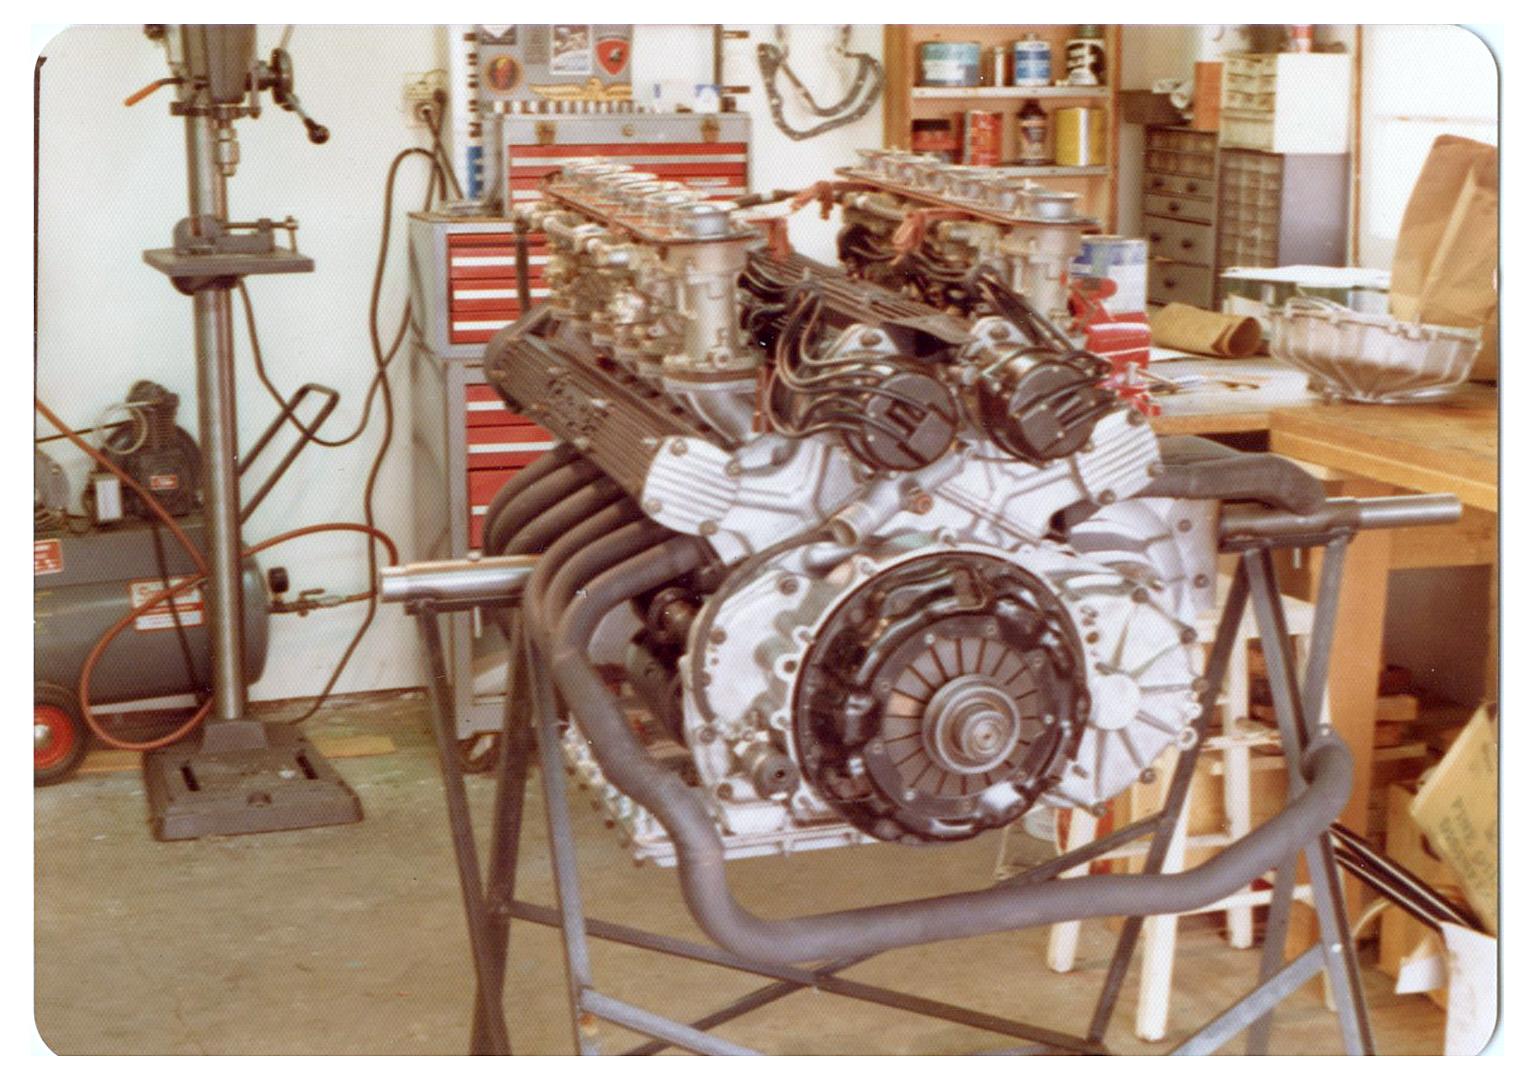 1968 Miura engine pulled